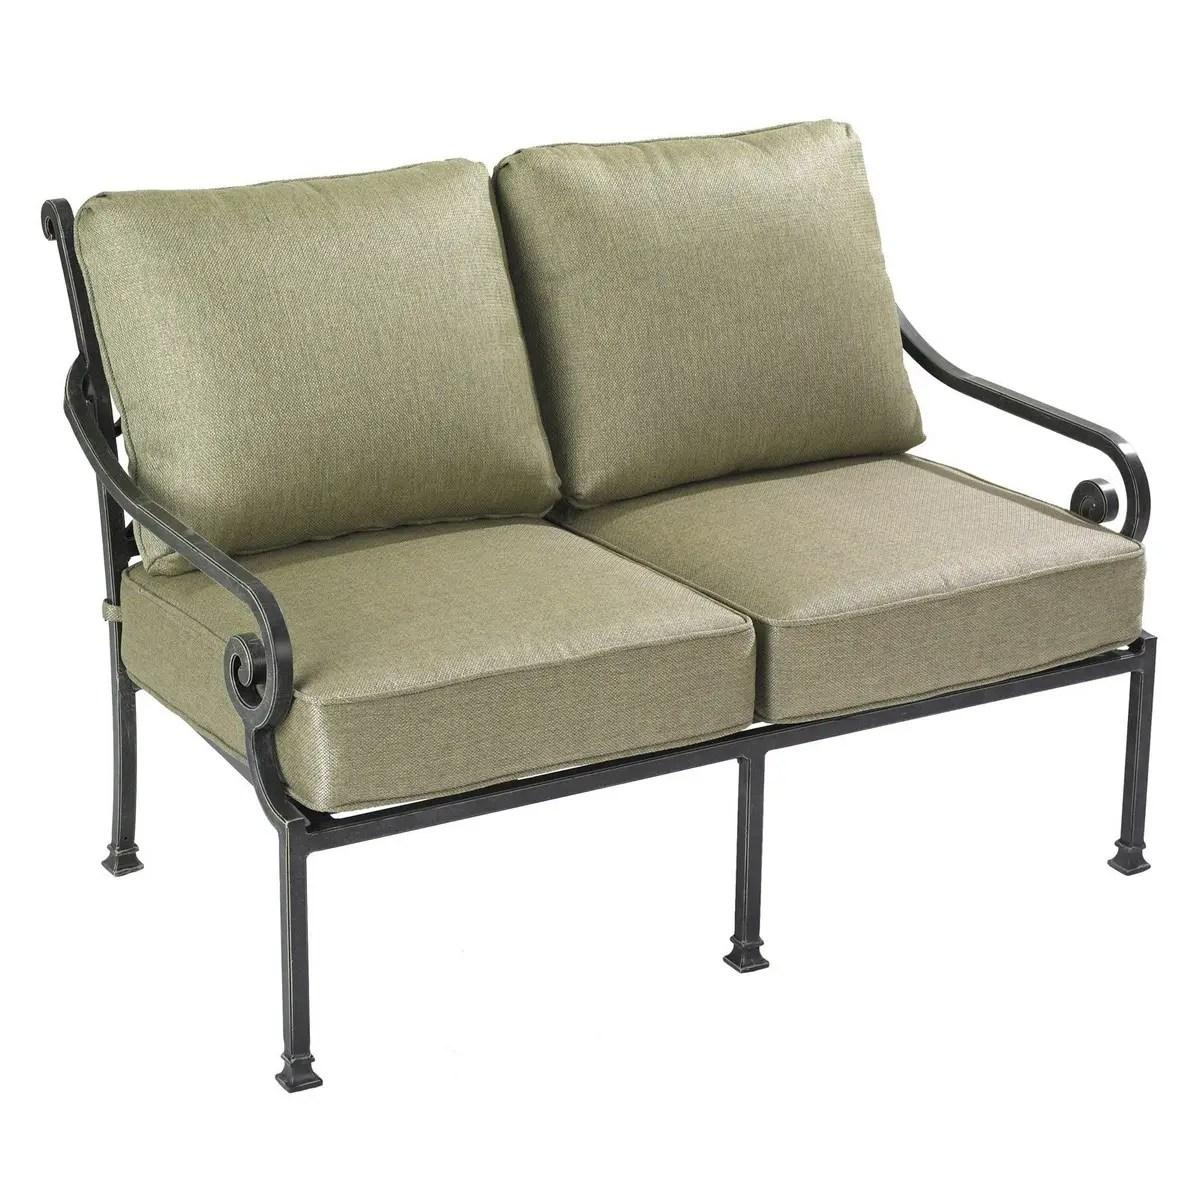 sofas furniture world serta sophia convertible sofa bed kew 68711431 garden